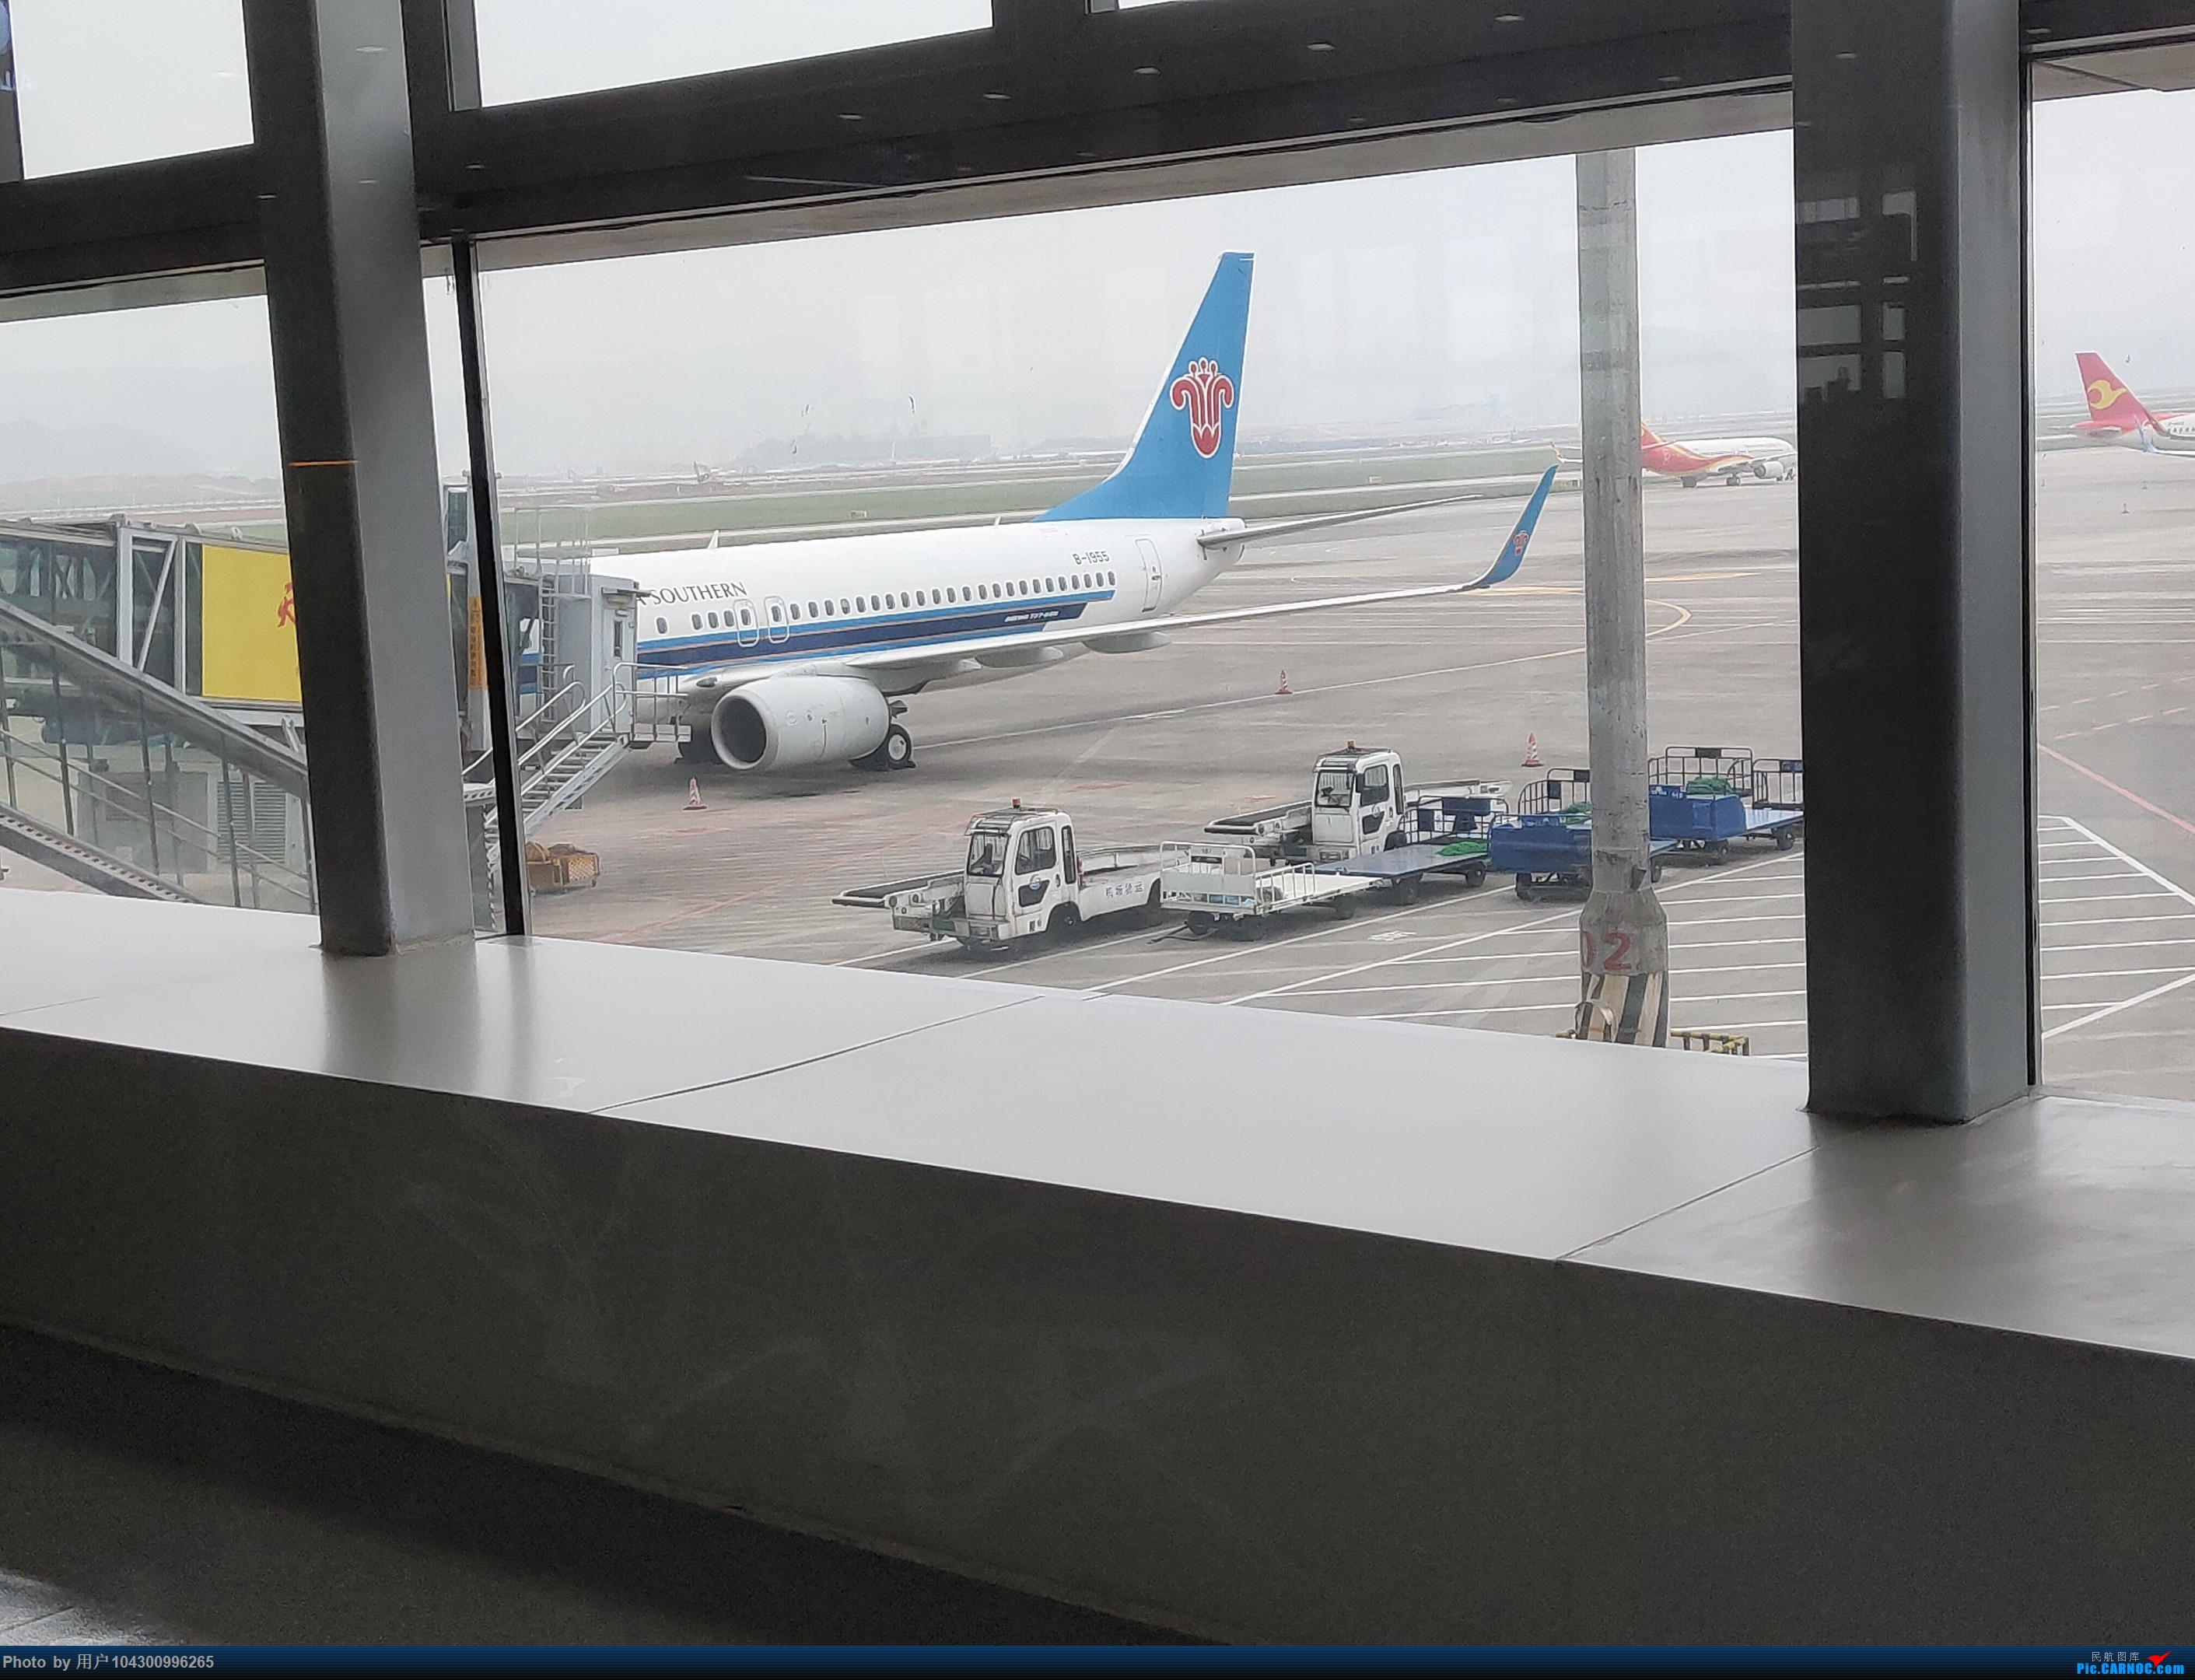 Re:DM游记之GY贵阳-成都往返(参观空港花田) BOEING 737-800 B-1955 中国贵阳龙洞堡国际机场